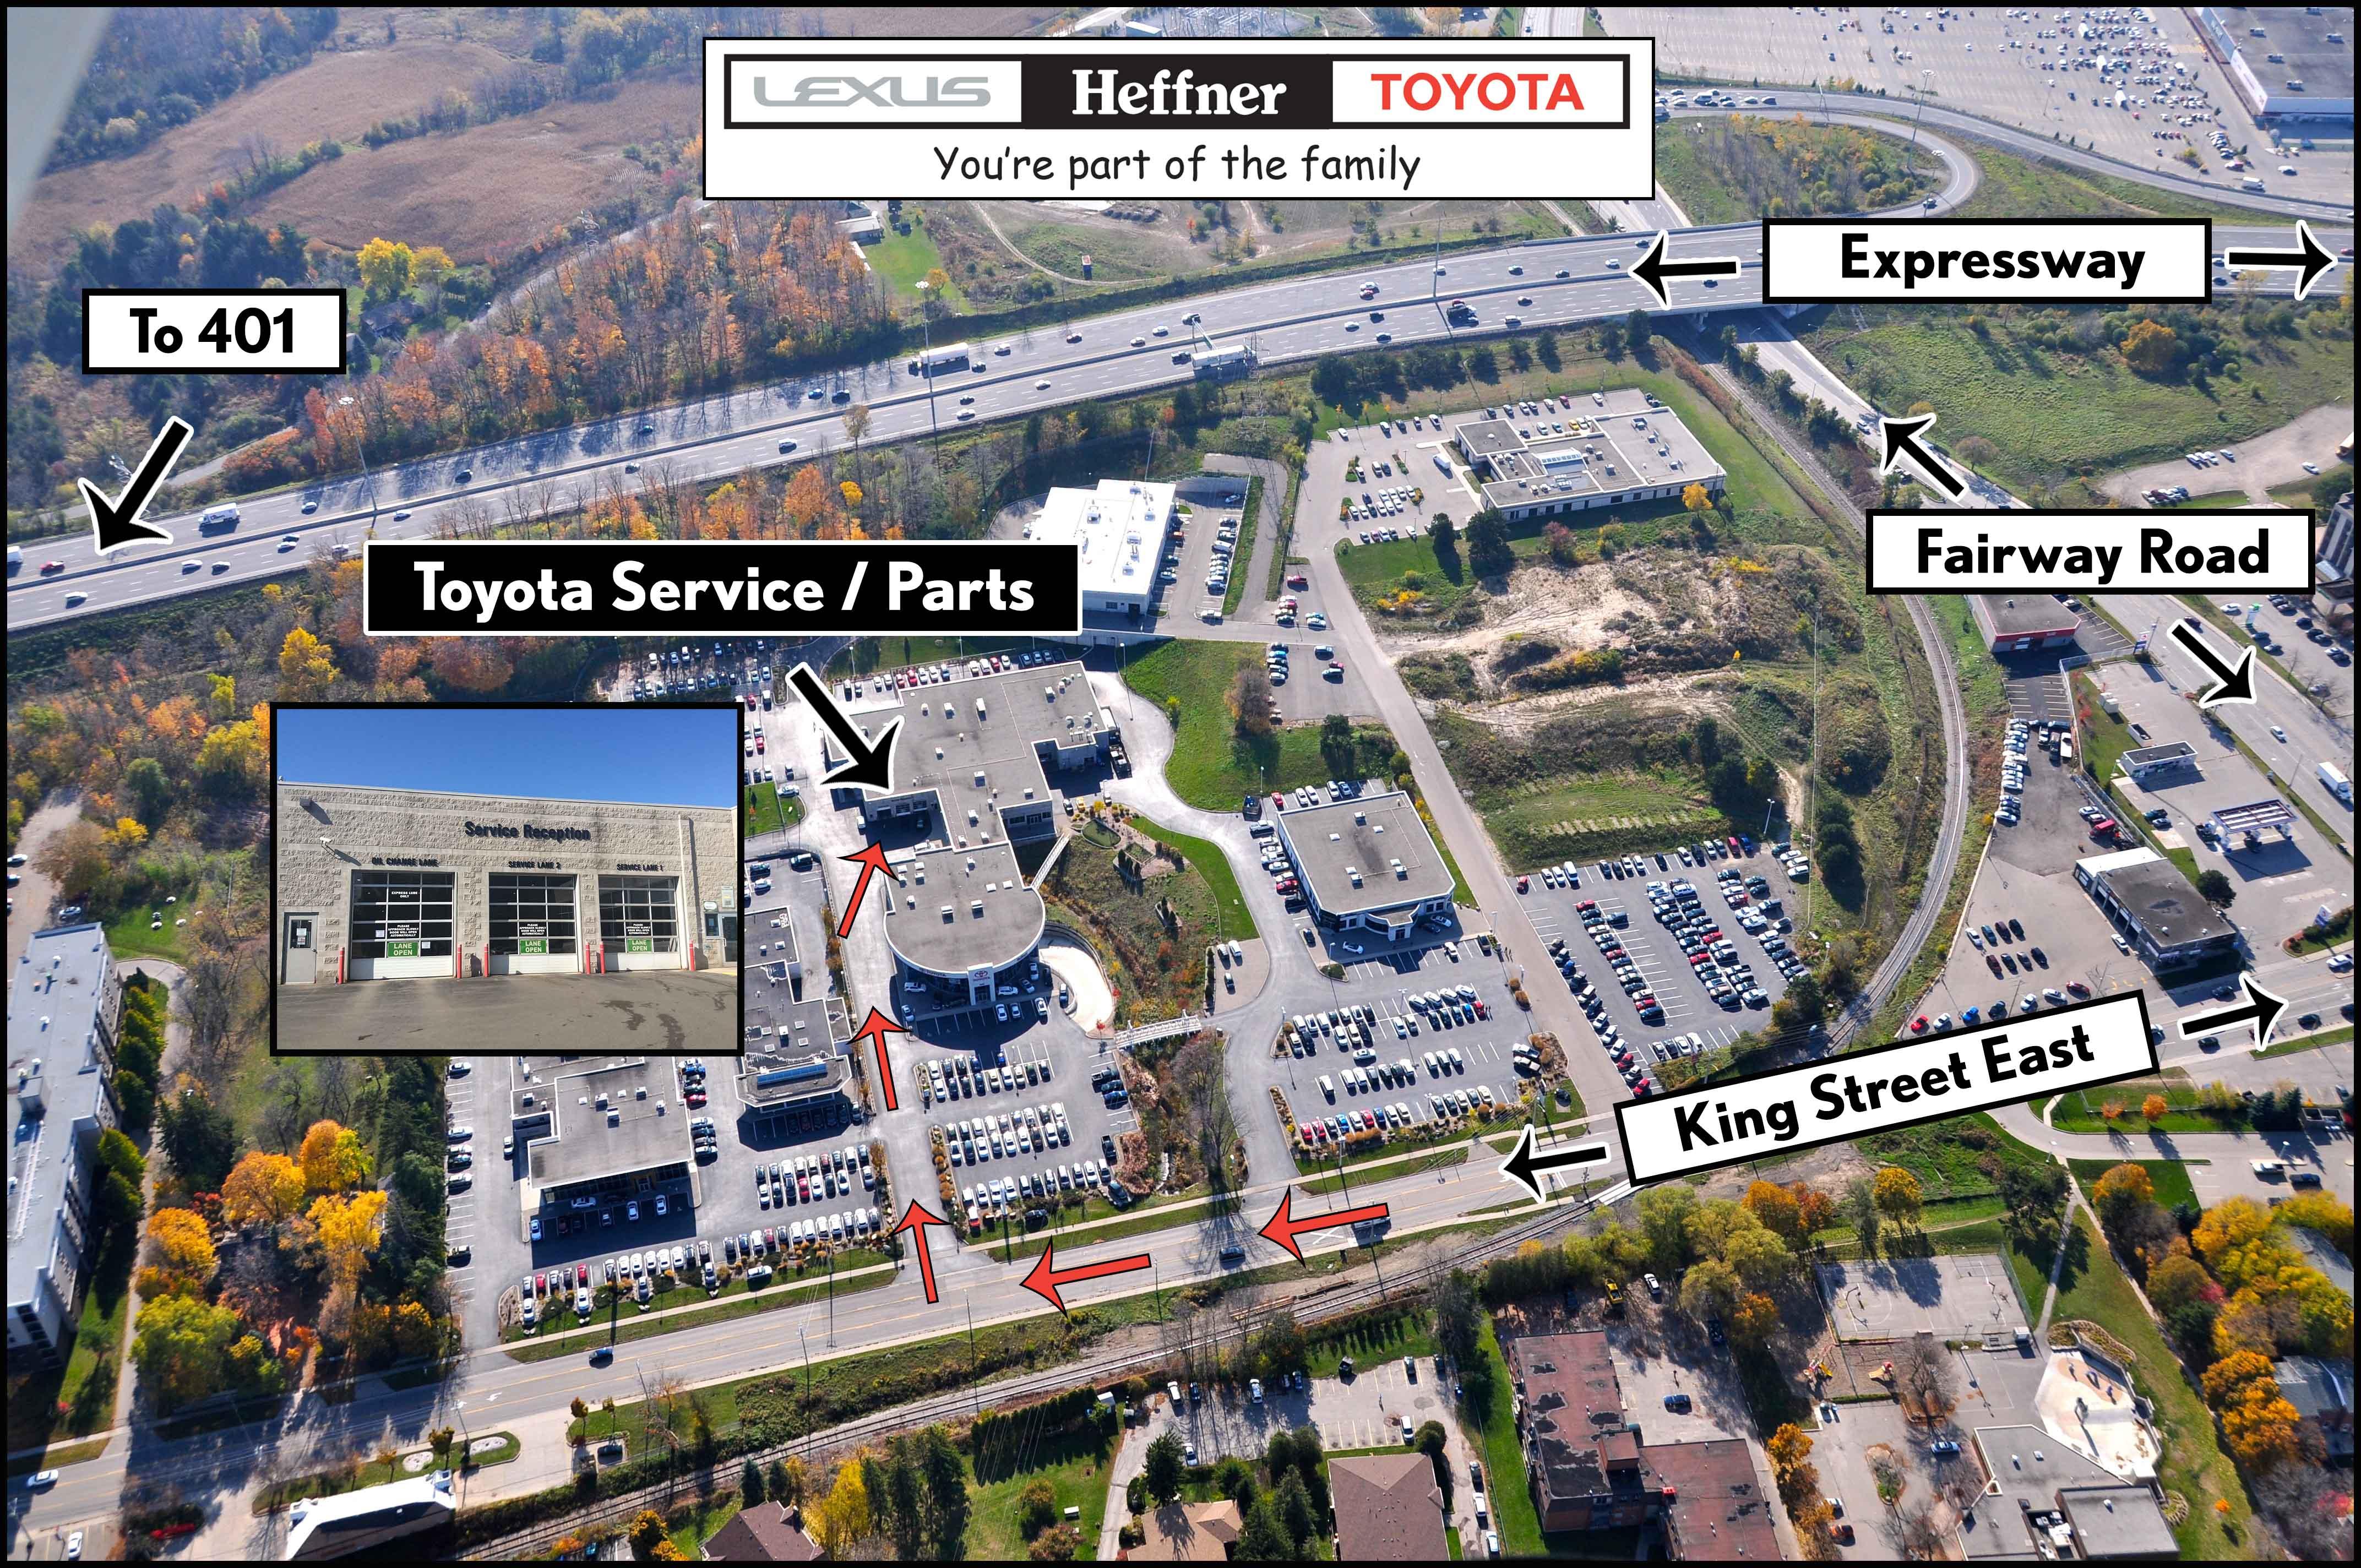 Heffner Toyota Service Map